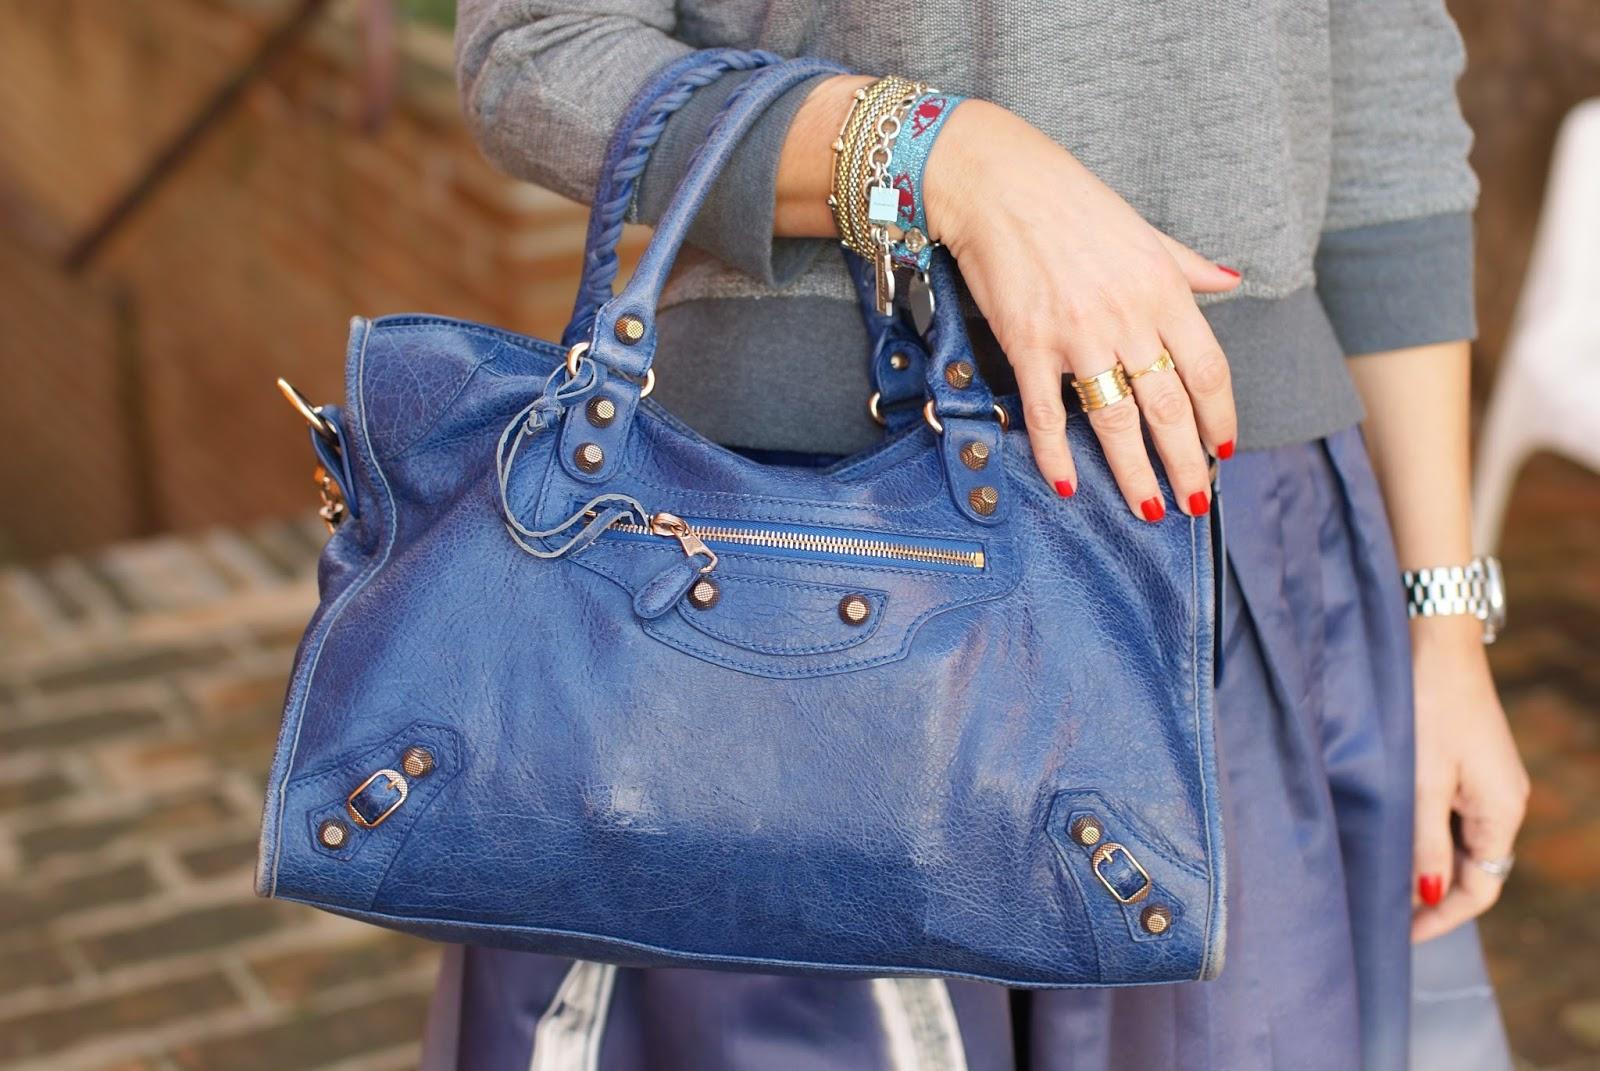 Balenciaga City cobalt blue bag, Fashion and Cookies, fashion blogger